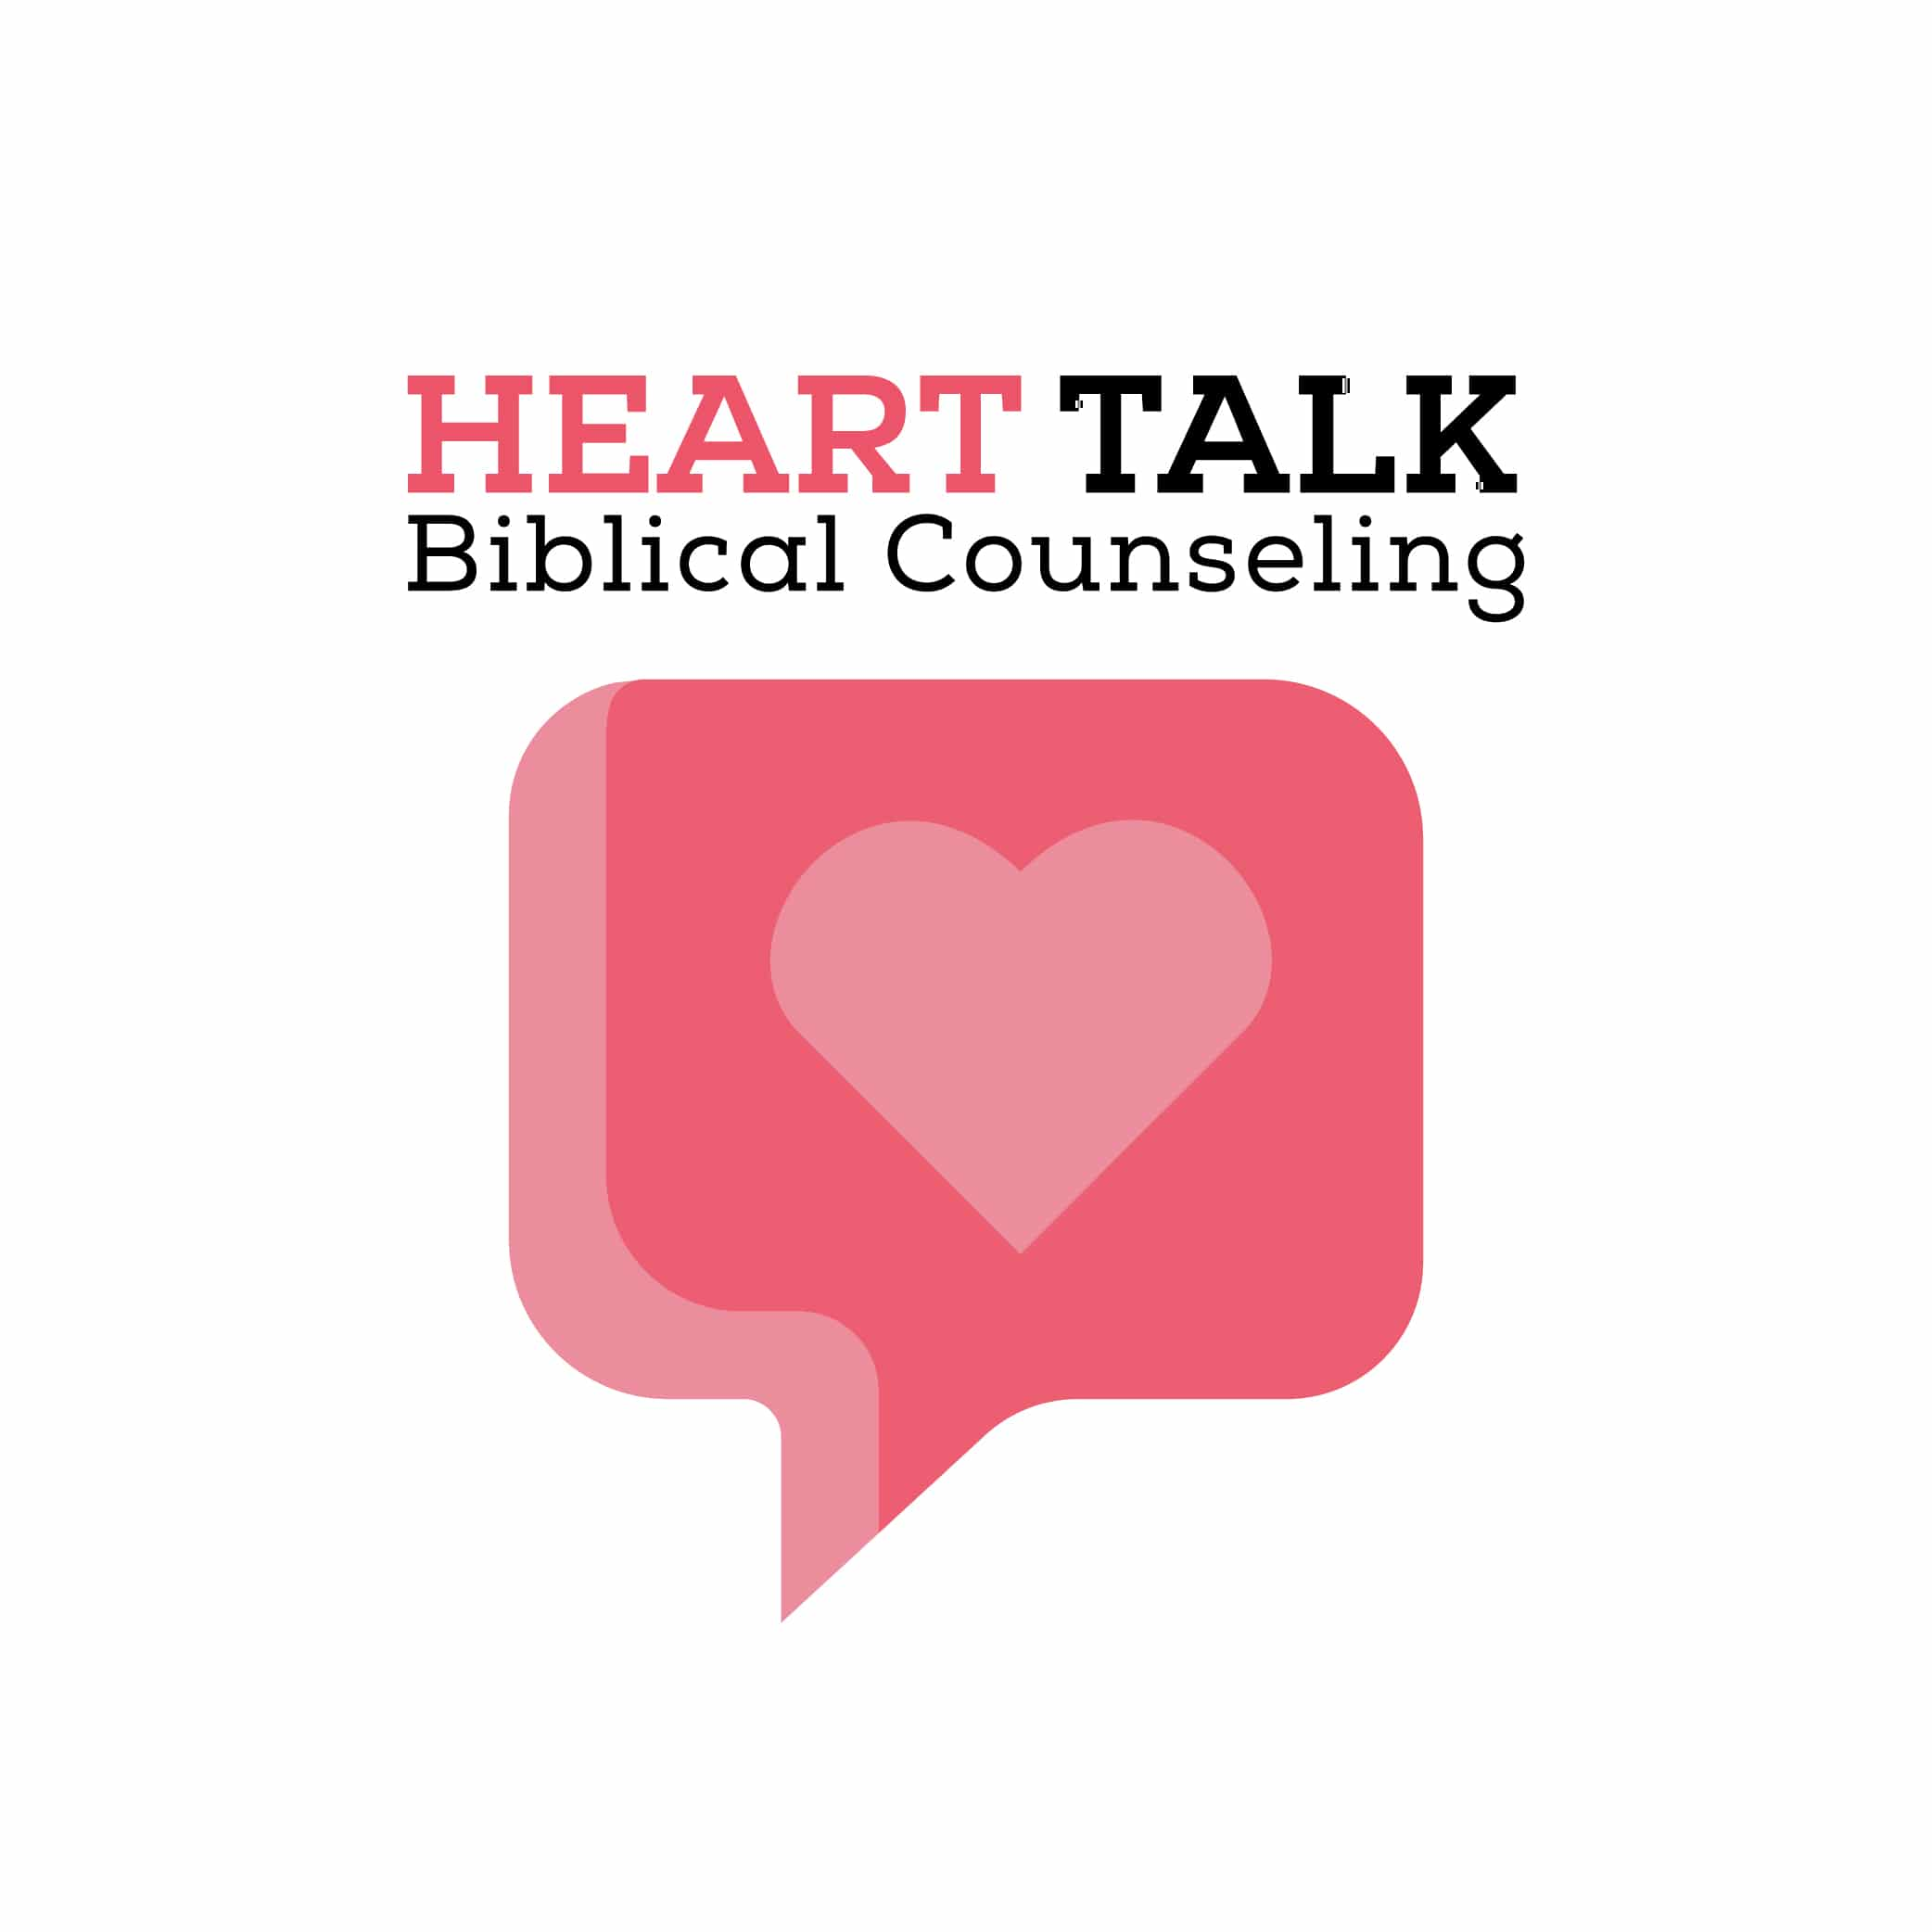 Heart Talk Biblical Counseling